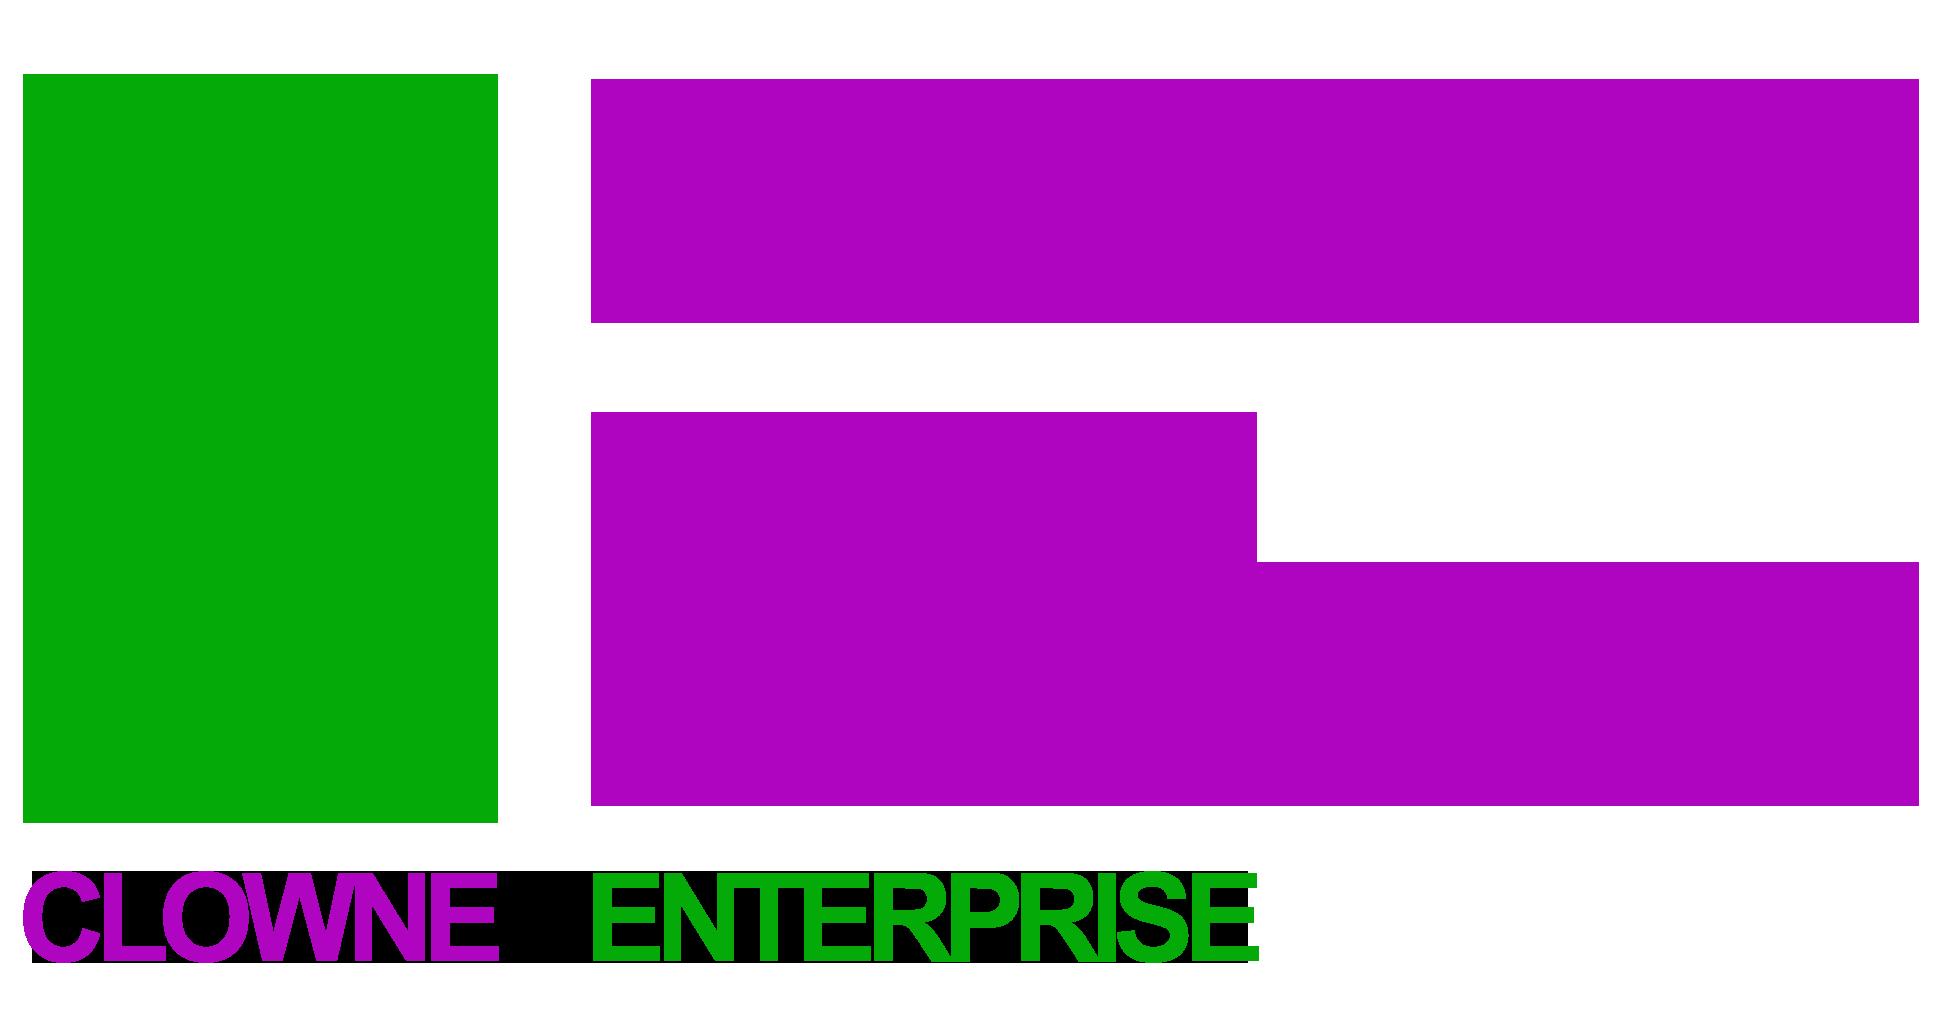 Clowne Enterprise Learning Resources